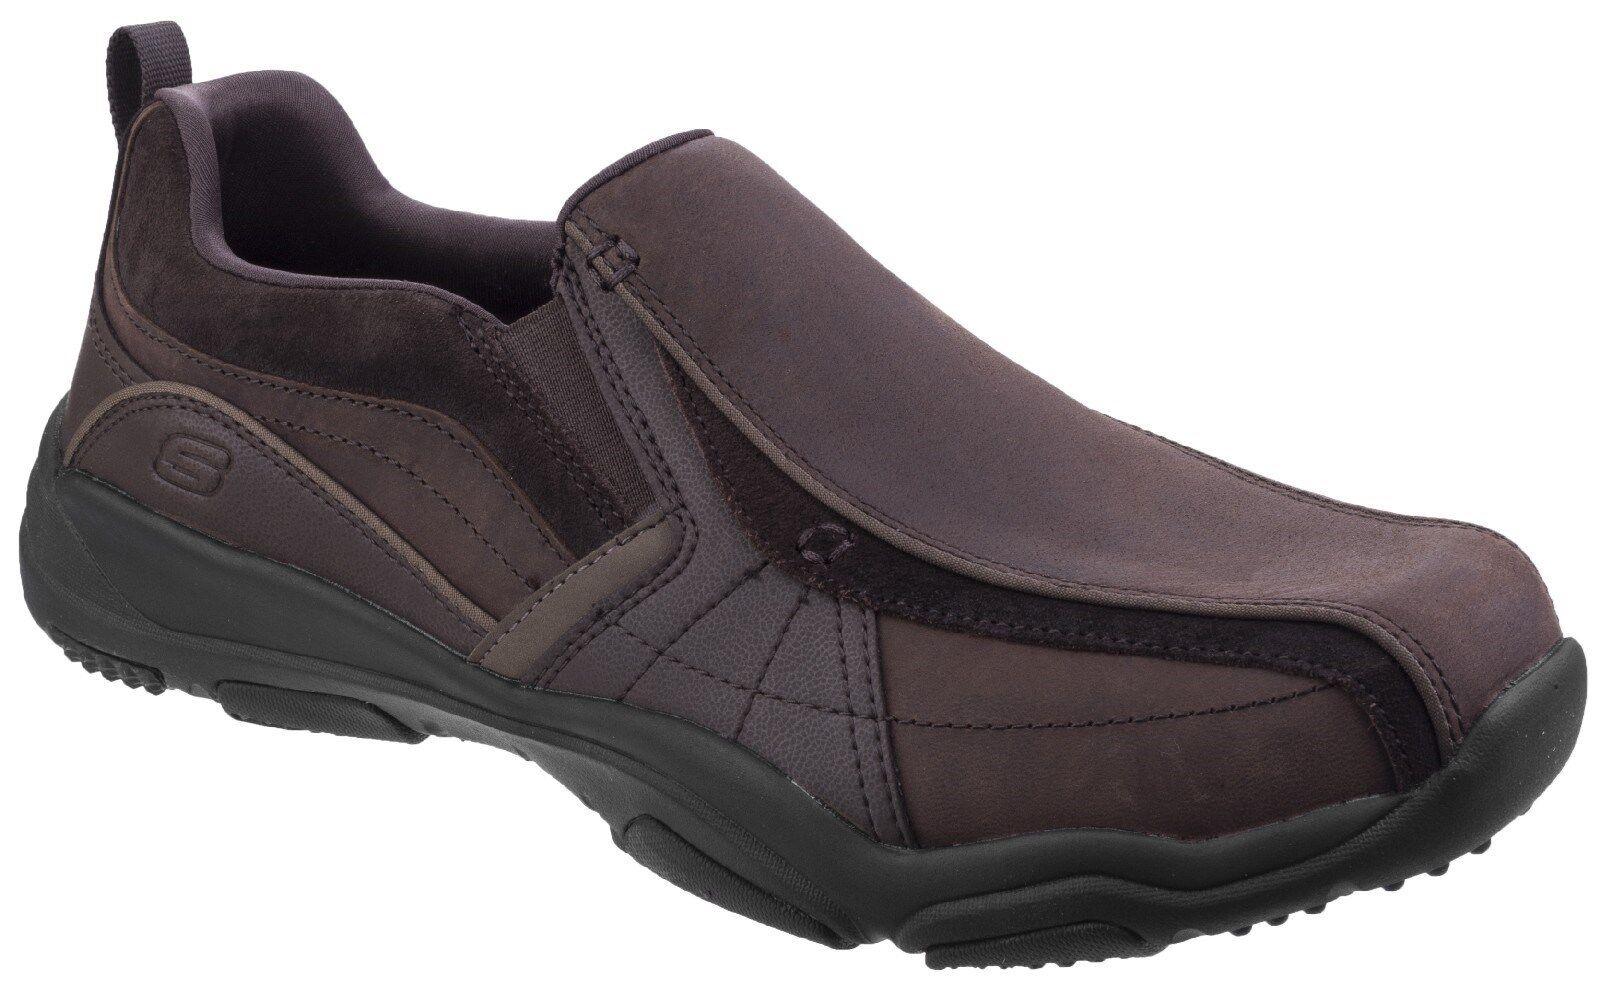 Skechers Larson Berto Leather Slip On Shoes Casual Leather Berto Memory Foam Loafers Mens 6e6d0e